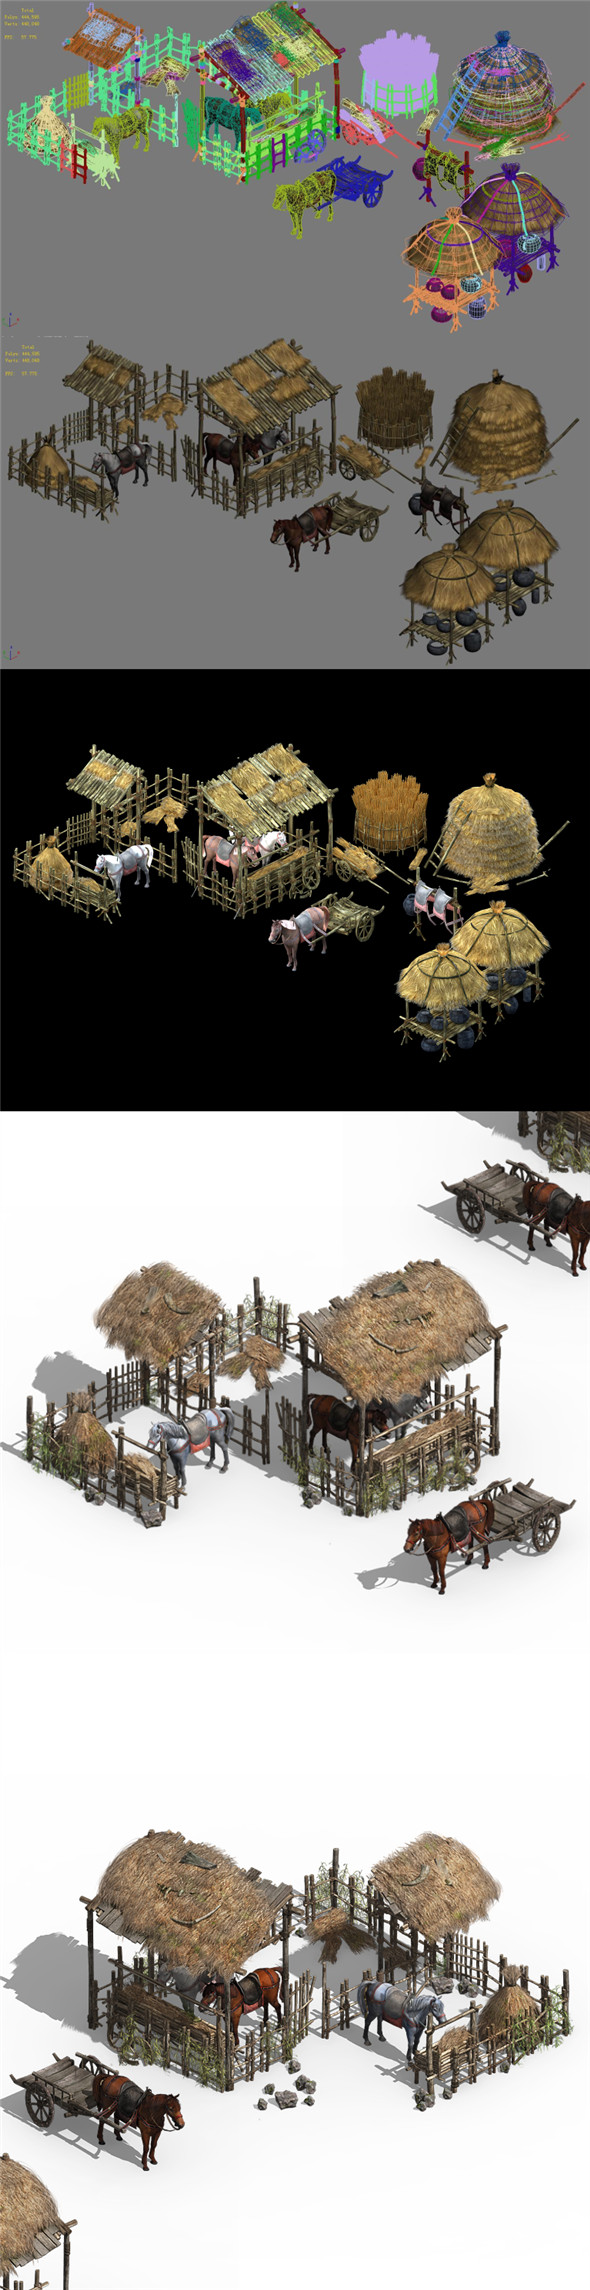 Horseback riding - Stables 04 - 3DOcean Item for Sale